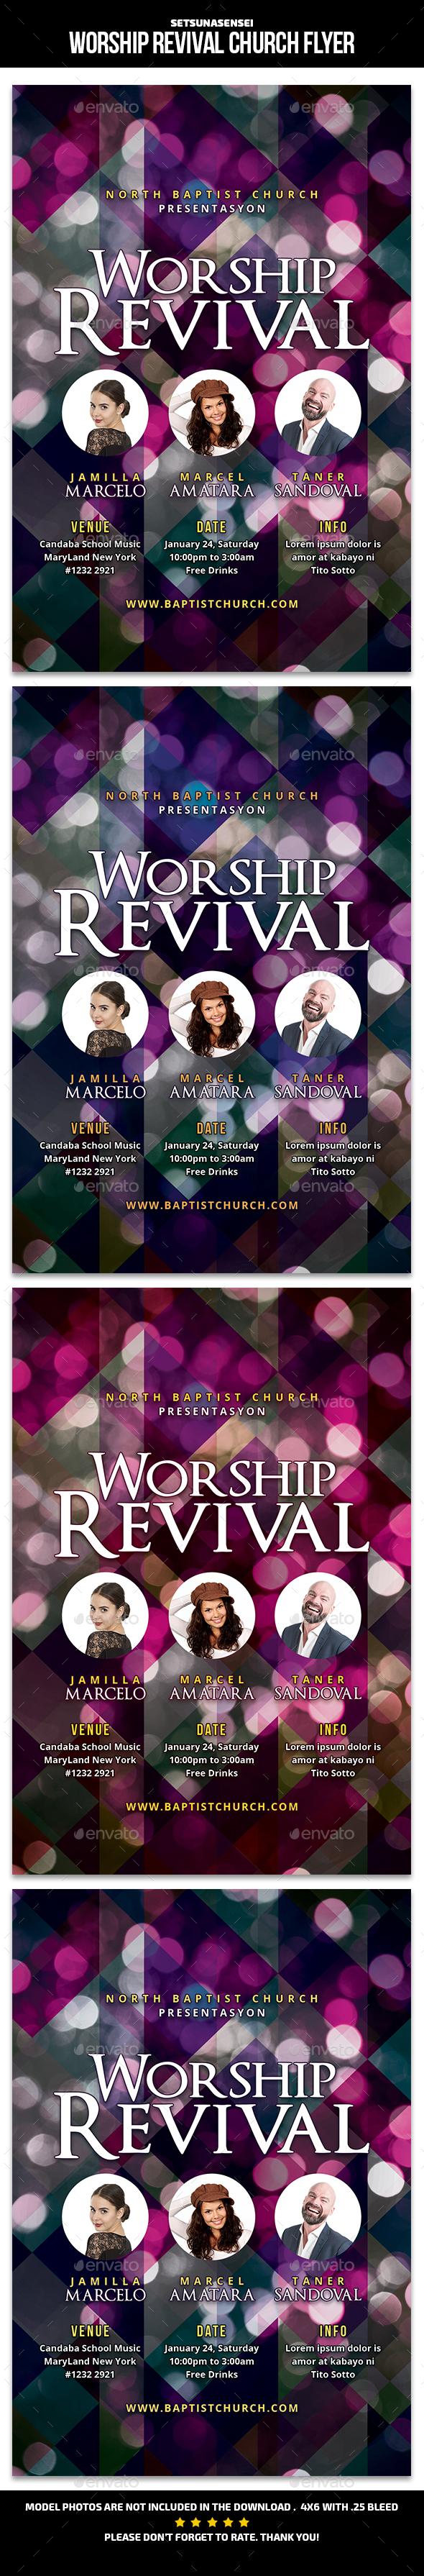 Worship Revival Church Flyer - Church Flyers